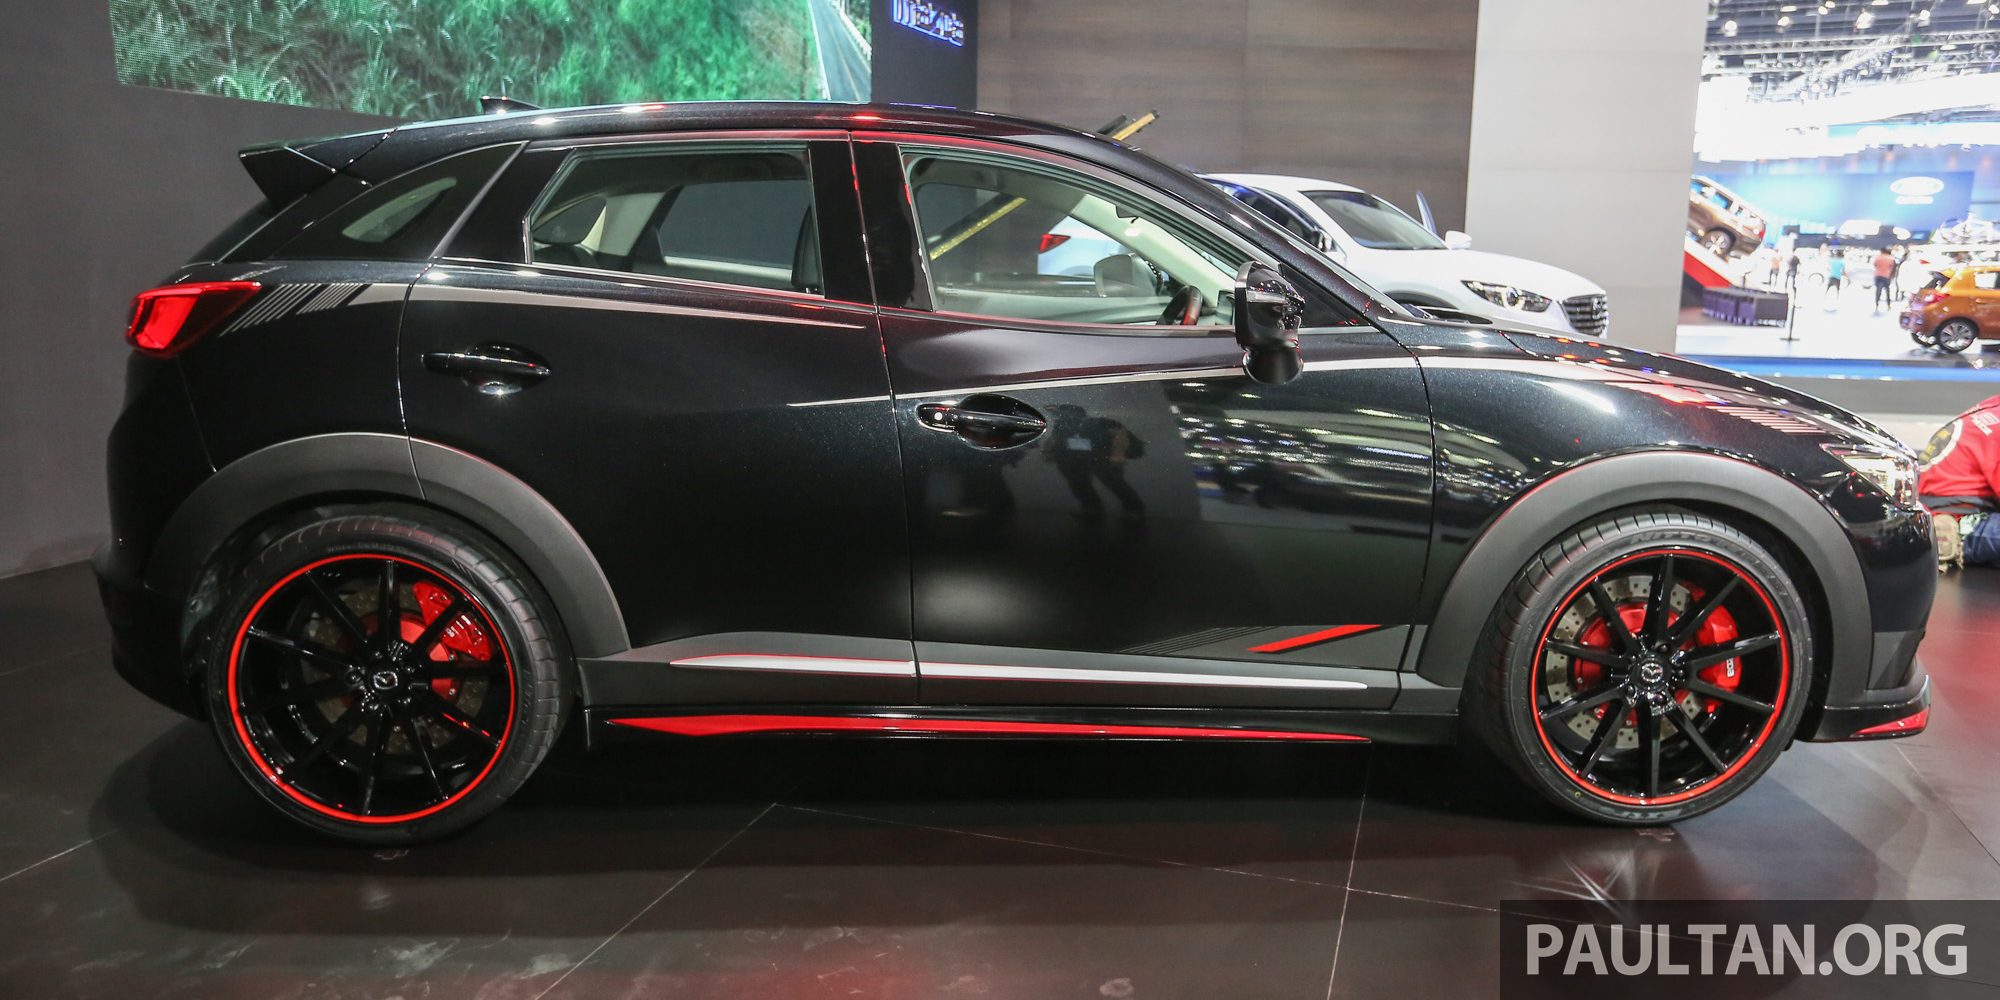 Gallery Mazda Cx 3 Racing Concept At Bangkok Paul Tan